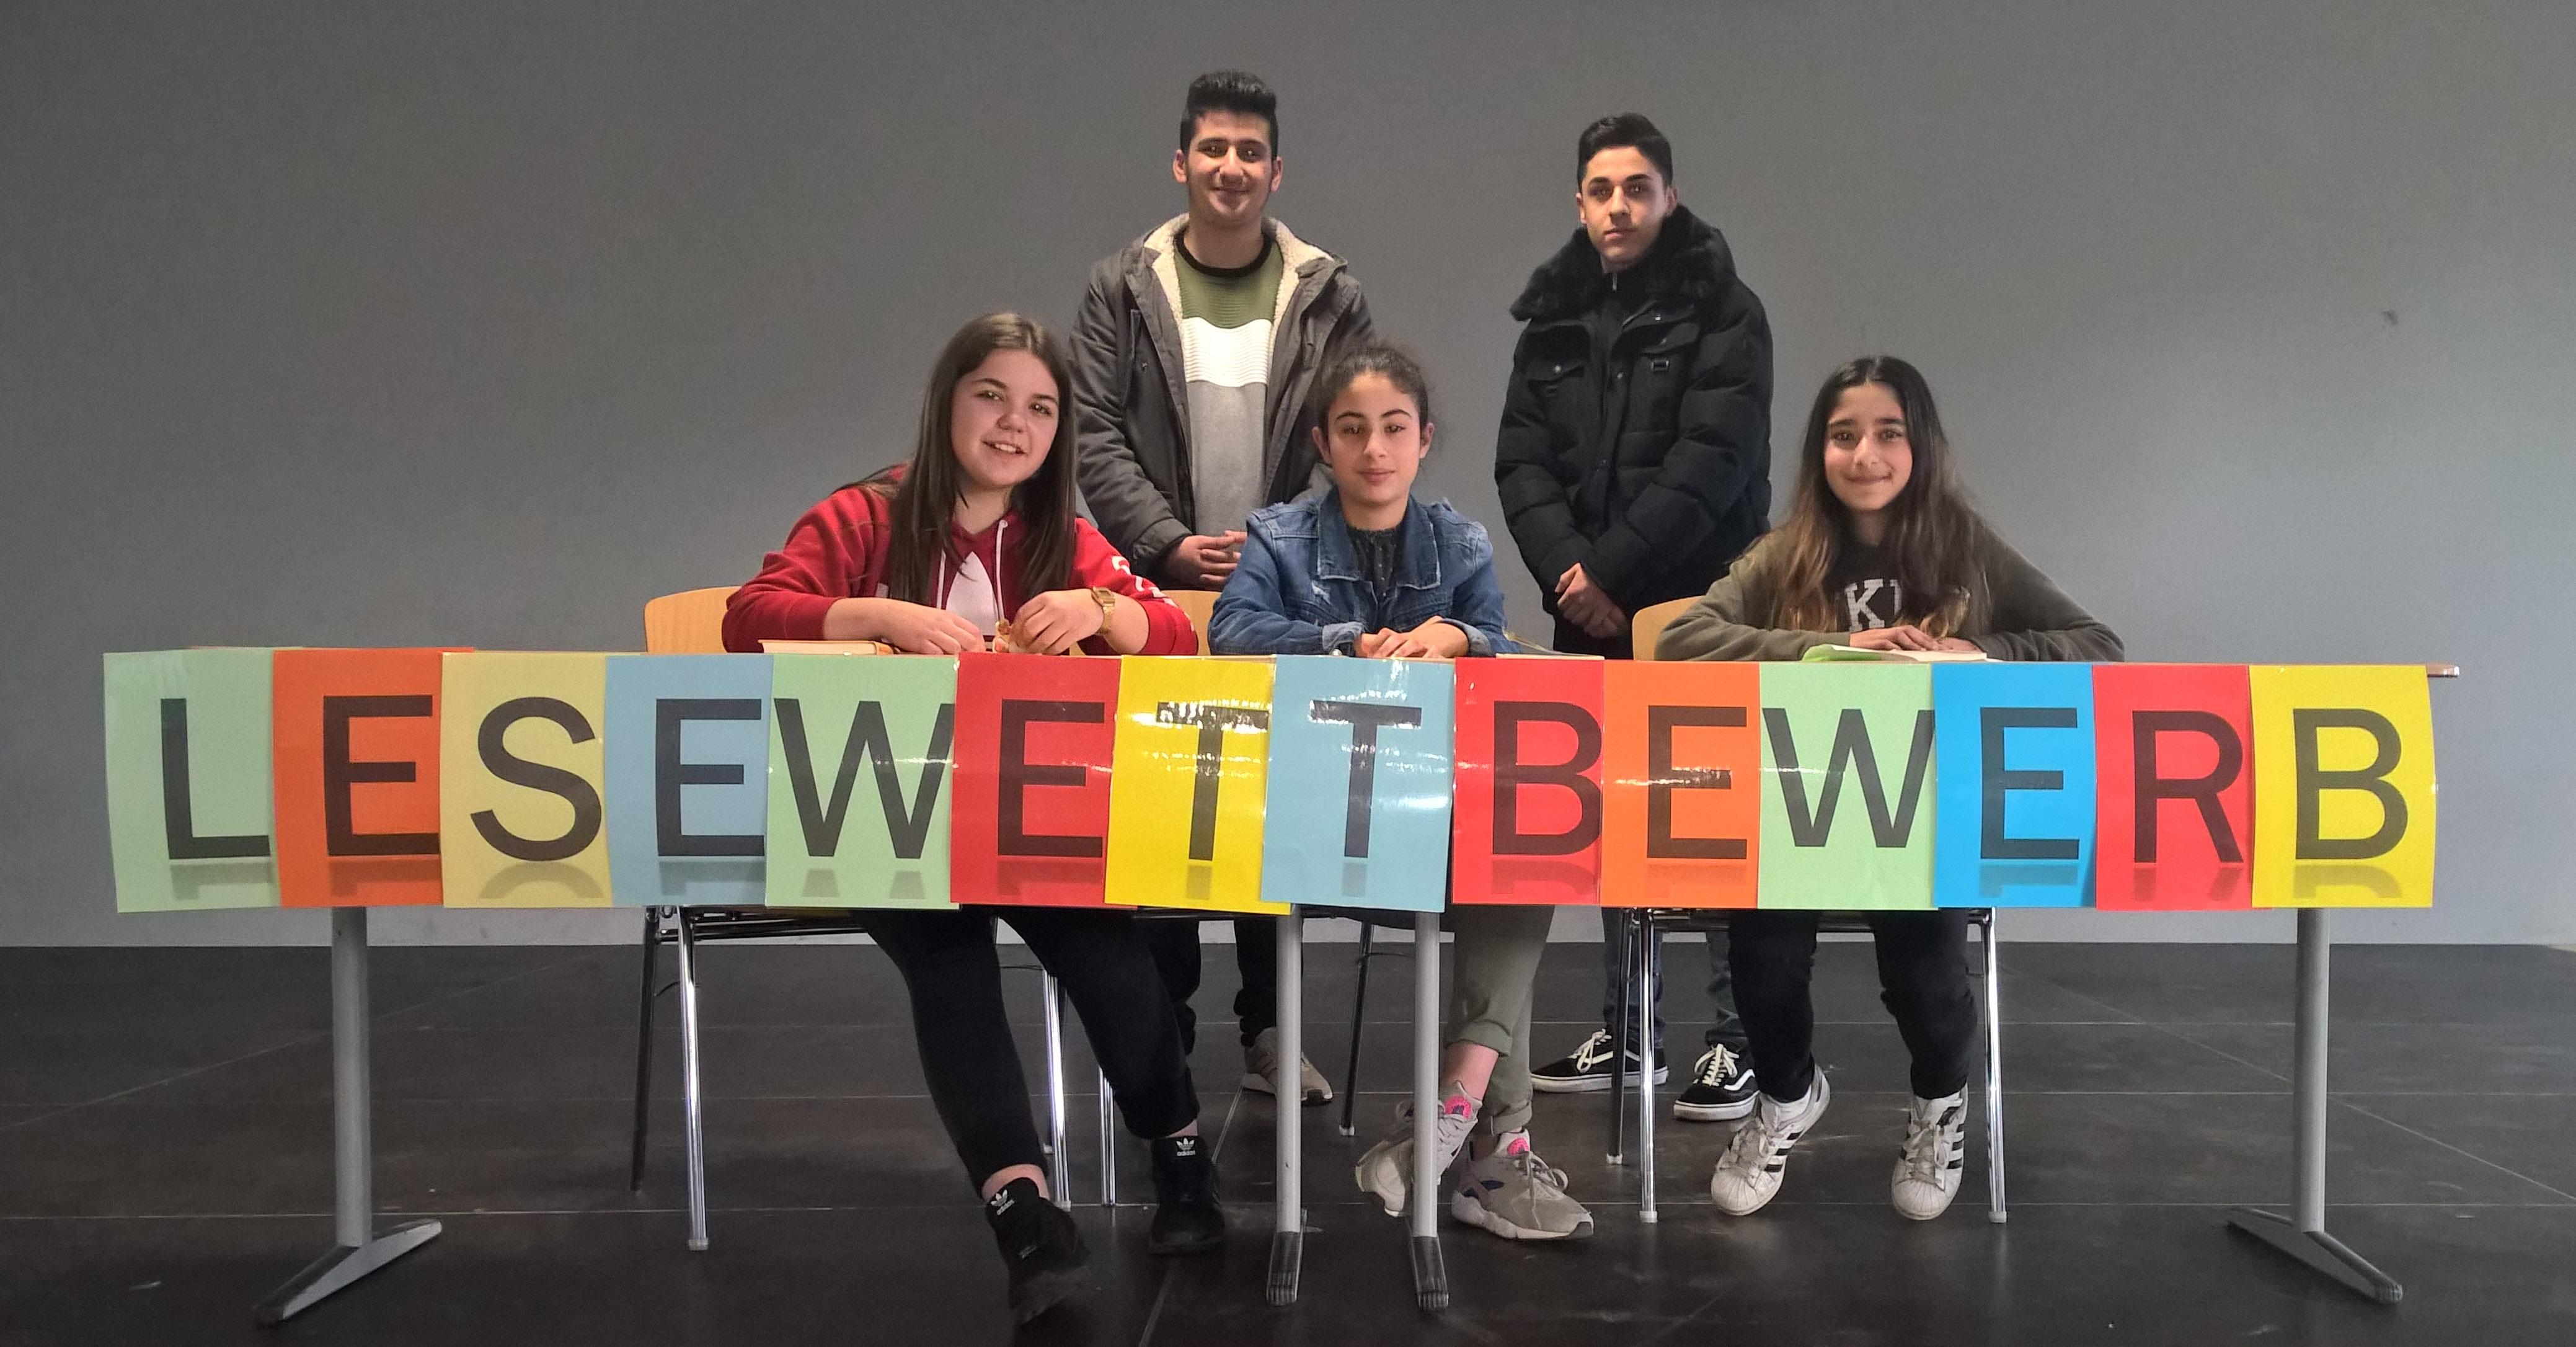 lesewettbewerb-2